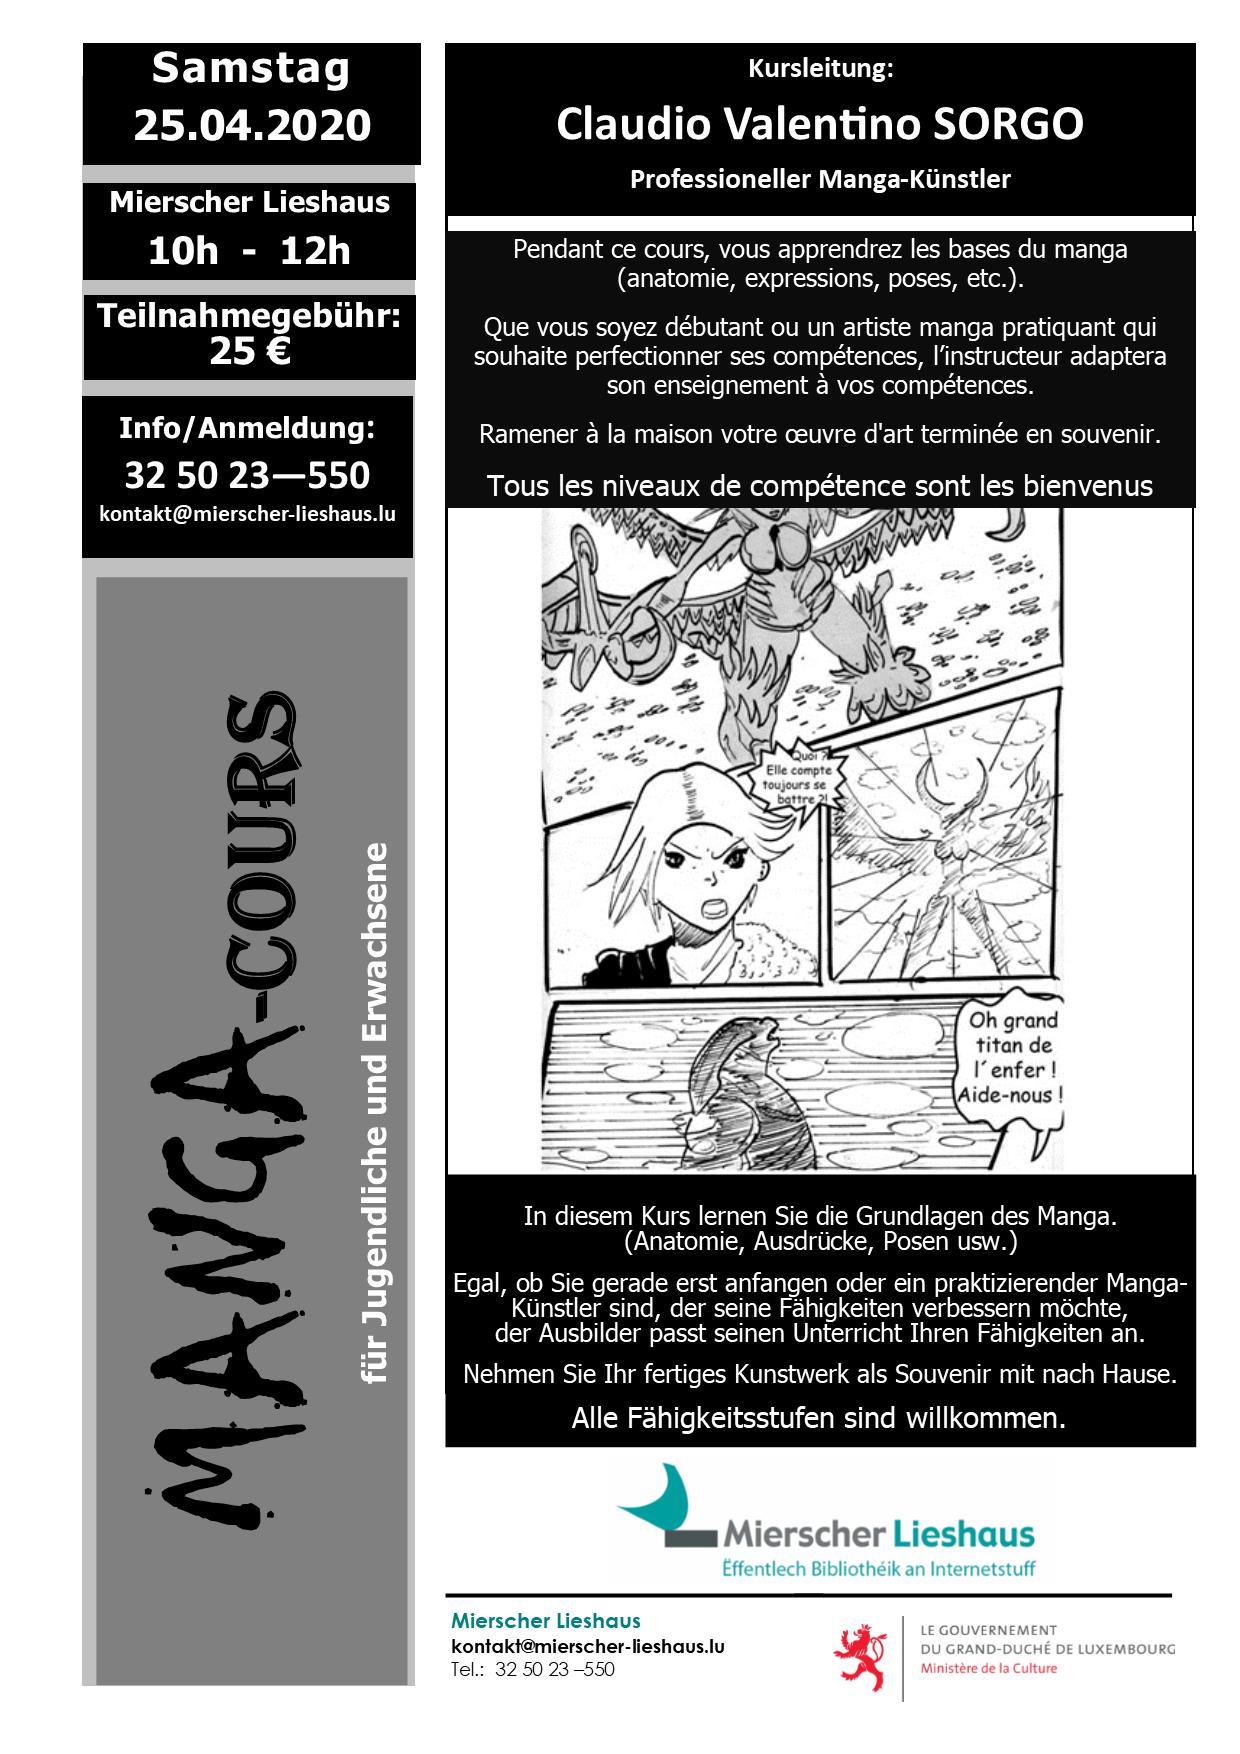 MANGA-COURS mit Claudio Valentino SORGO